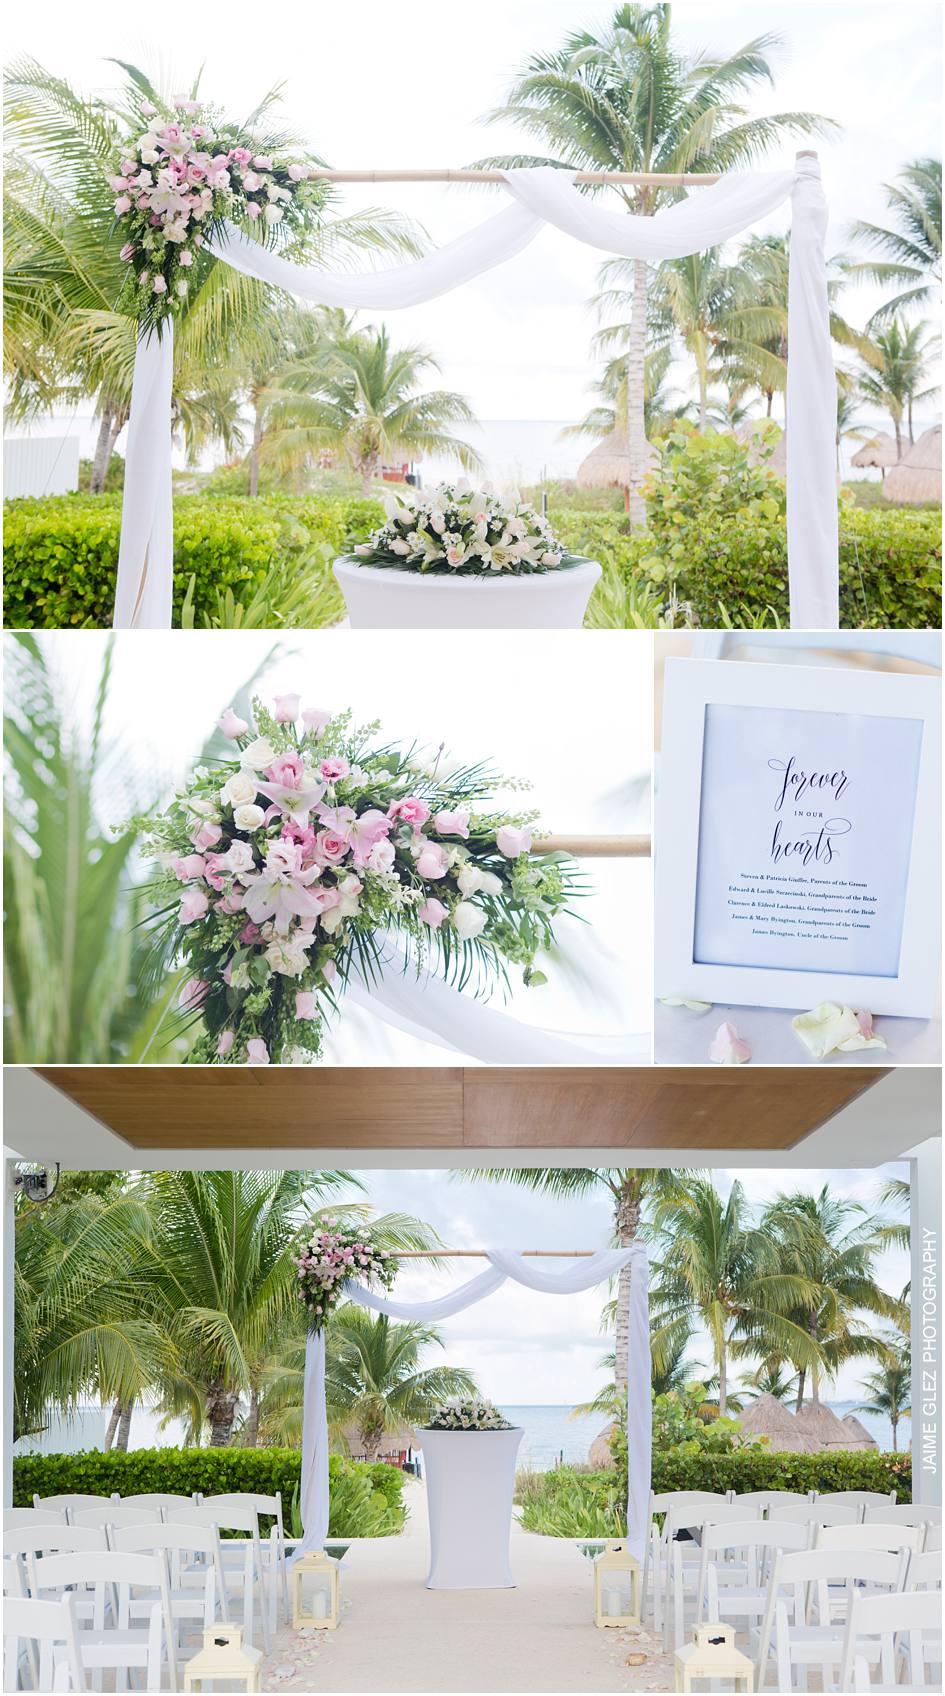 finest playa mujeres wedding photography 11